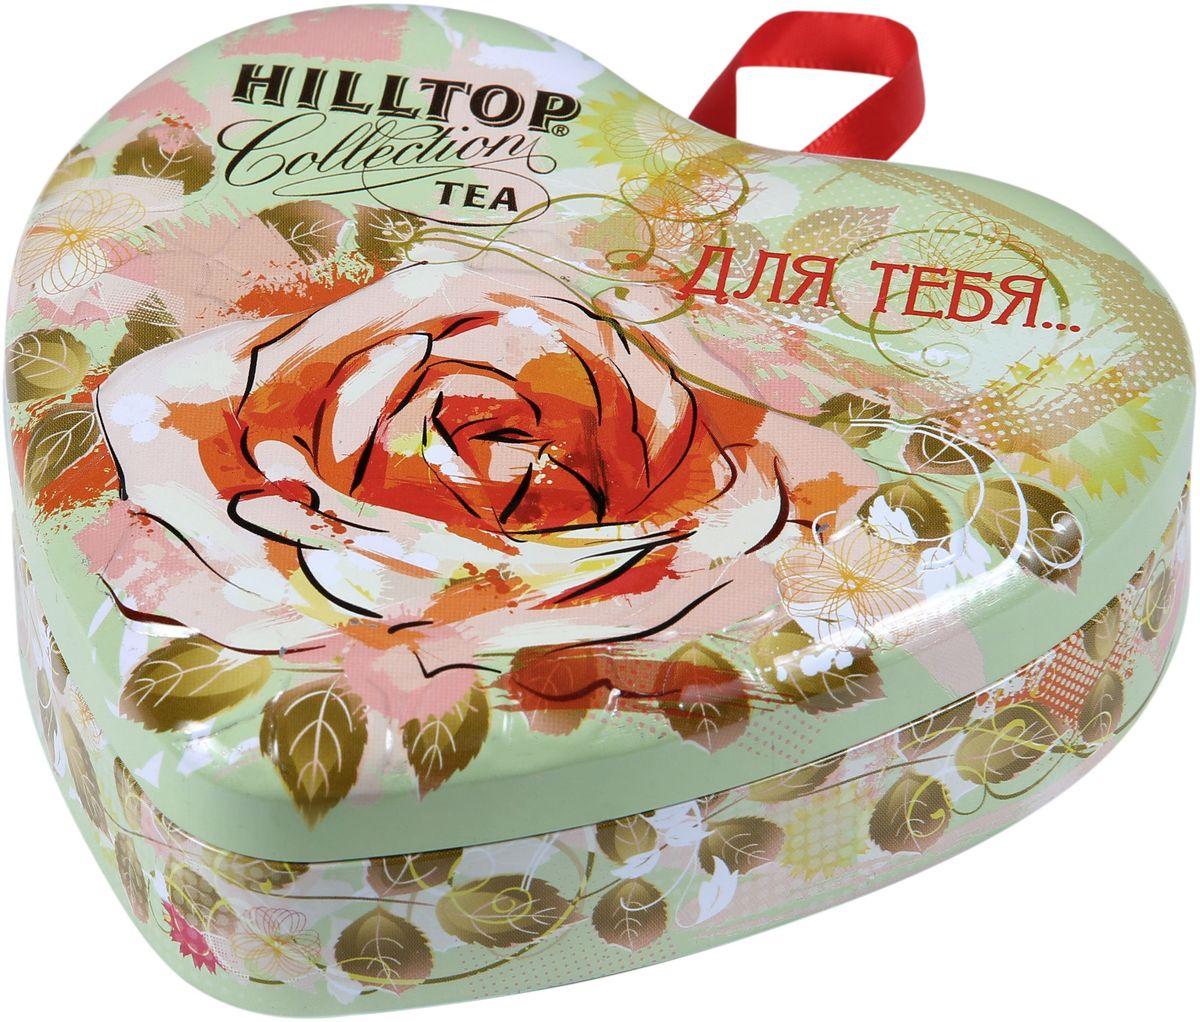 Hilltop Желаю счастья зеленый листовой чай, 50 г hilltop зеленая симфония зеленый листовой чай 100 г